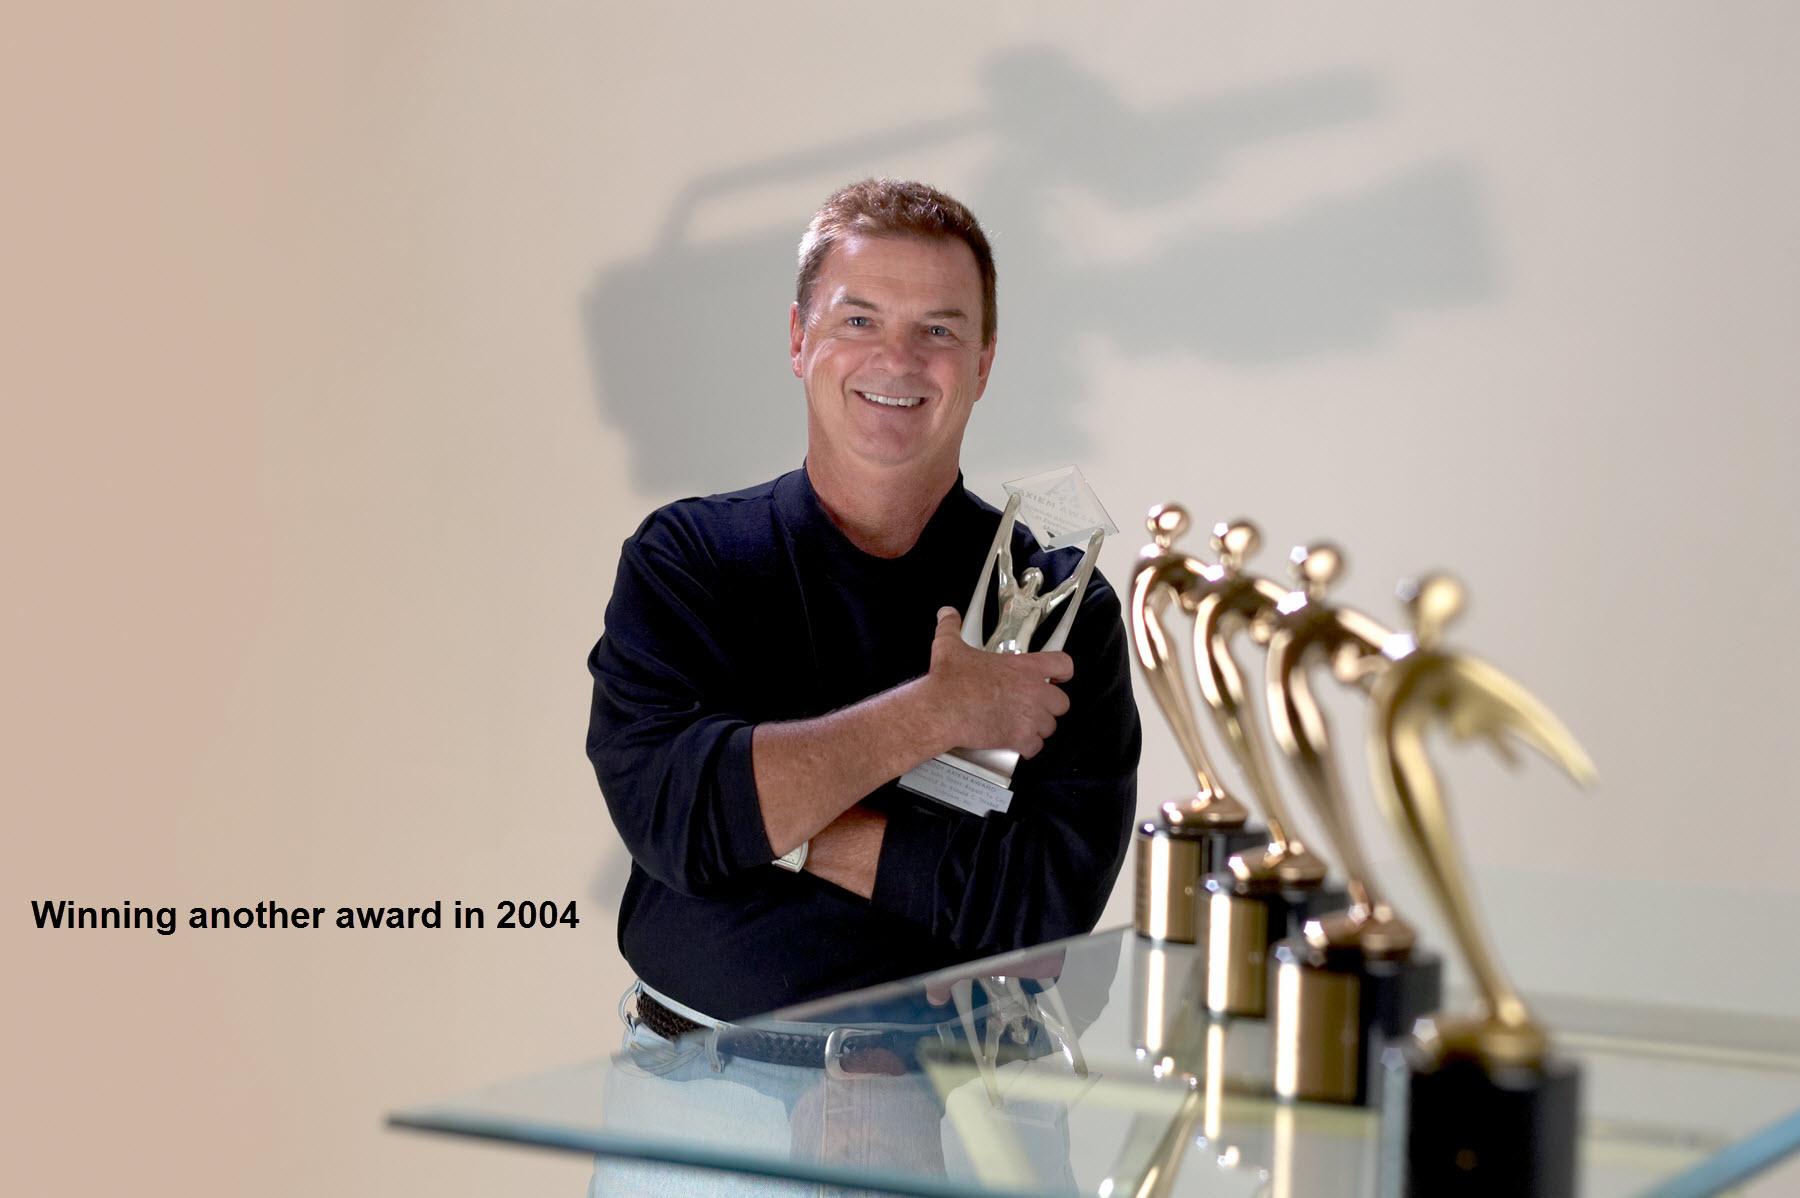 Corporate Video Production Awards | Ron Strobel